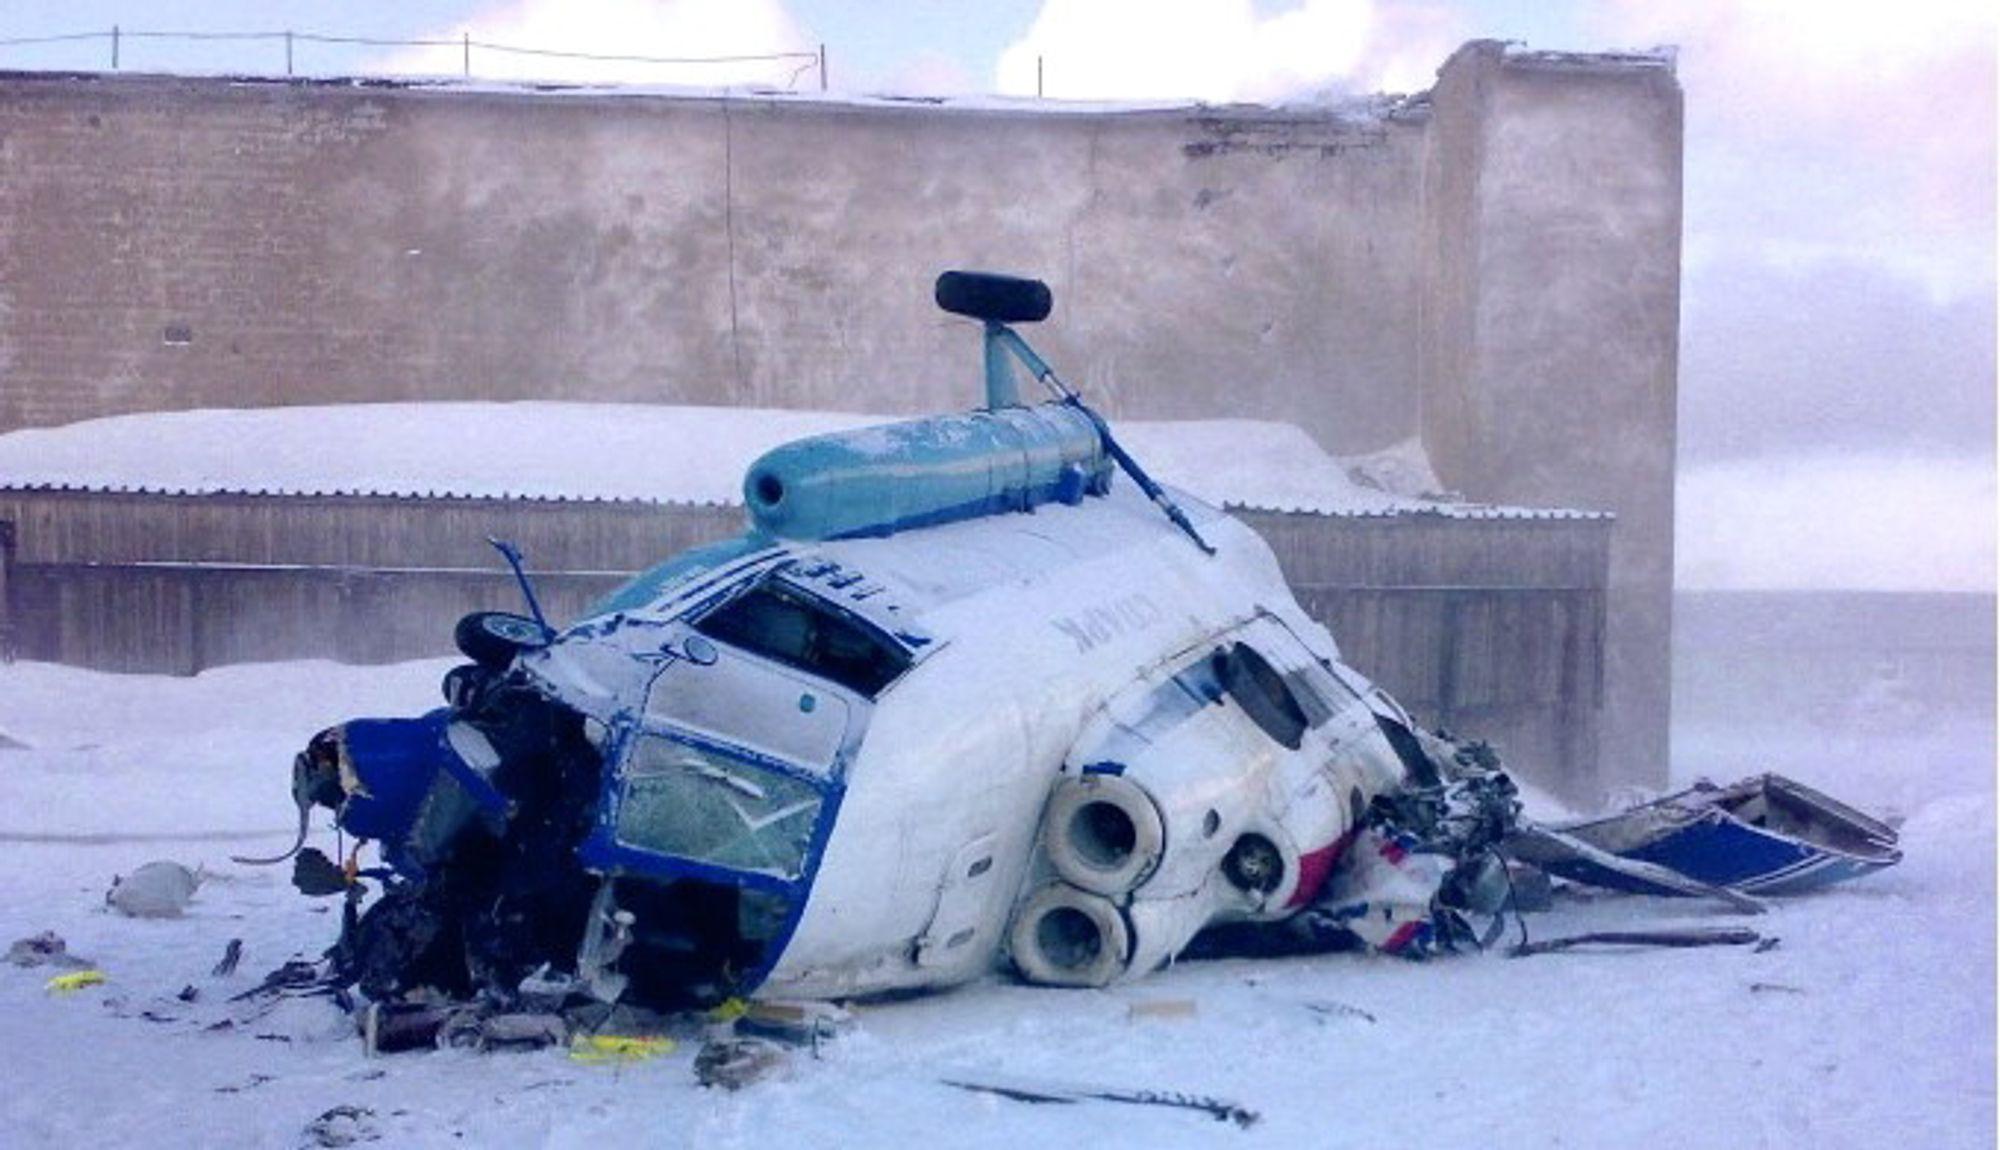 Tre omkom da dette Mi-8MT-helikopteret styrtet på Kapp Heer-basen 3,5 kilometer nord for Barentsburg på Svalbard 30. mars 2008.